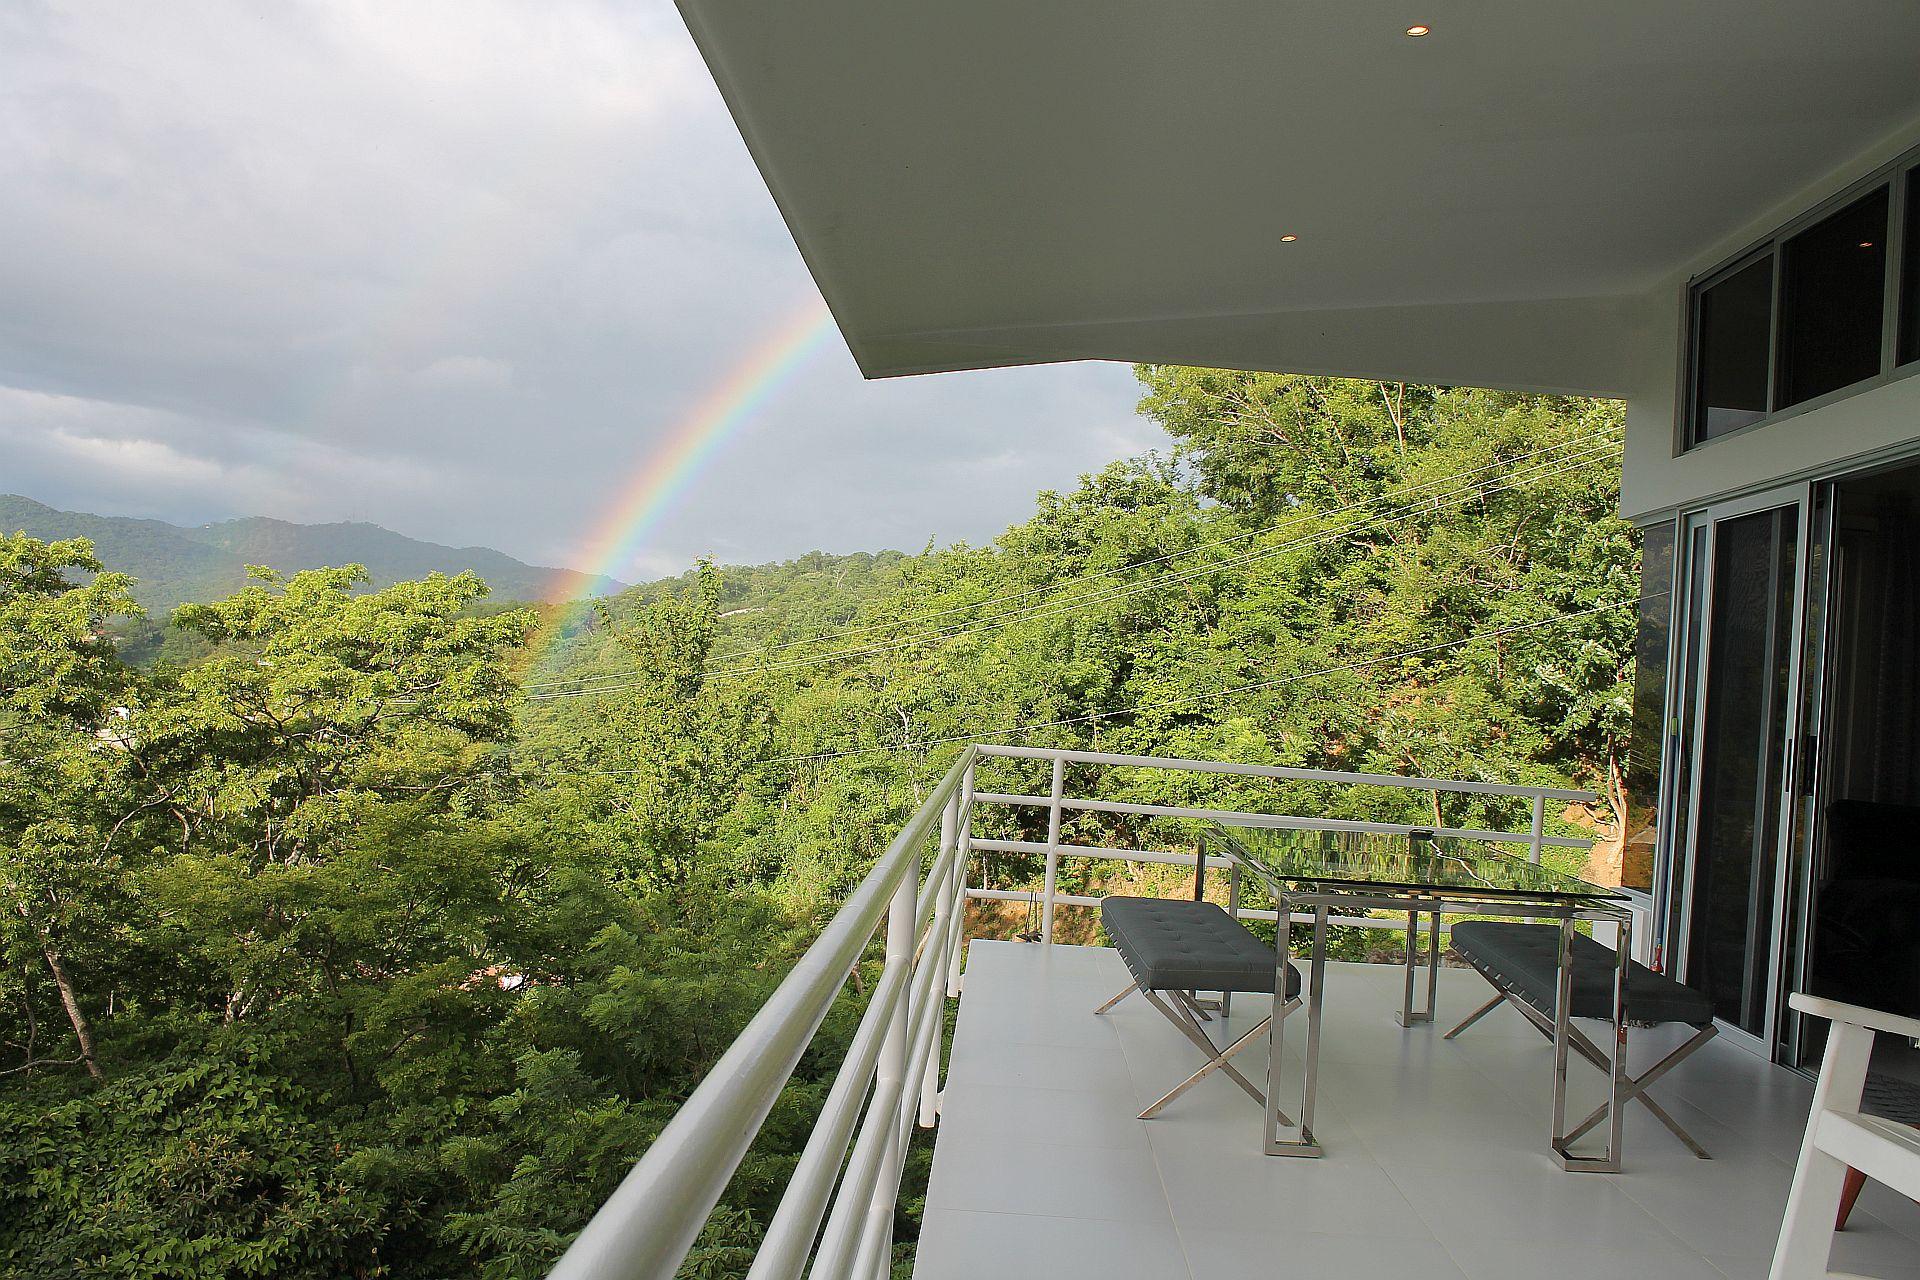 Balcony4-05.jpg